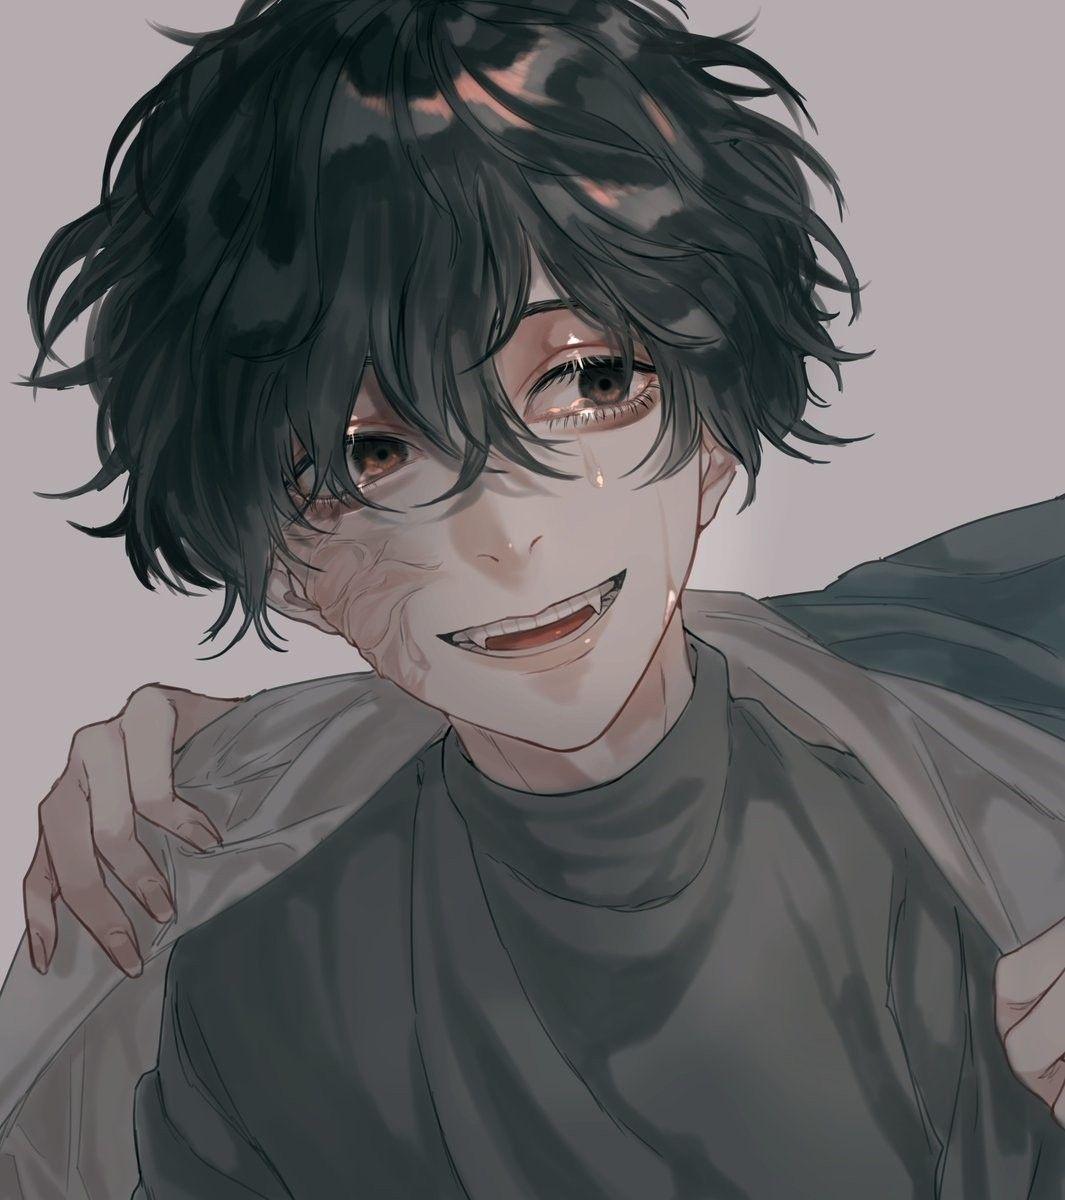 Pin By On Anime Boy Black Haired Anime Boy Yandere Anime Anime Boy Hair